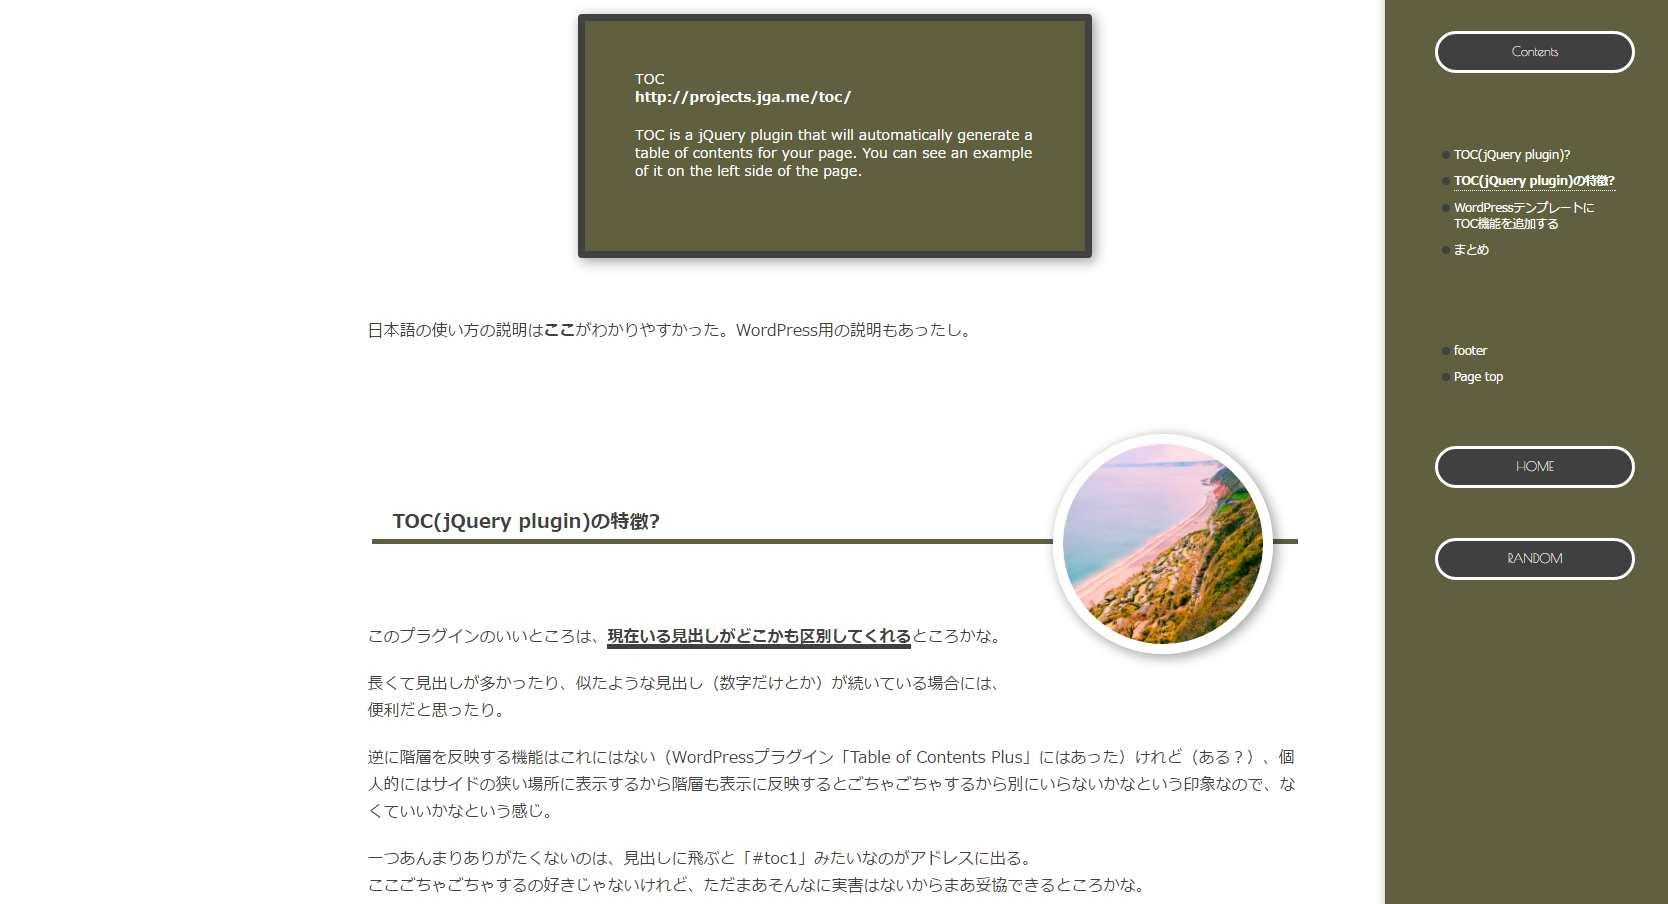 wpmb_screenshot12